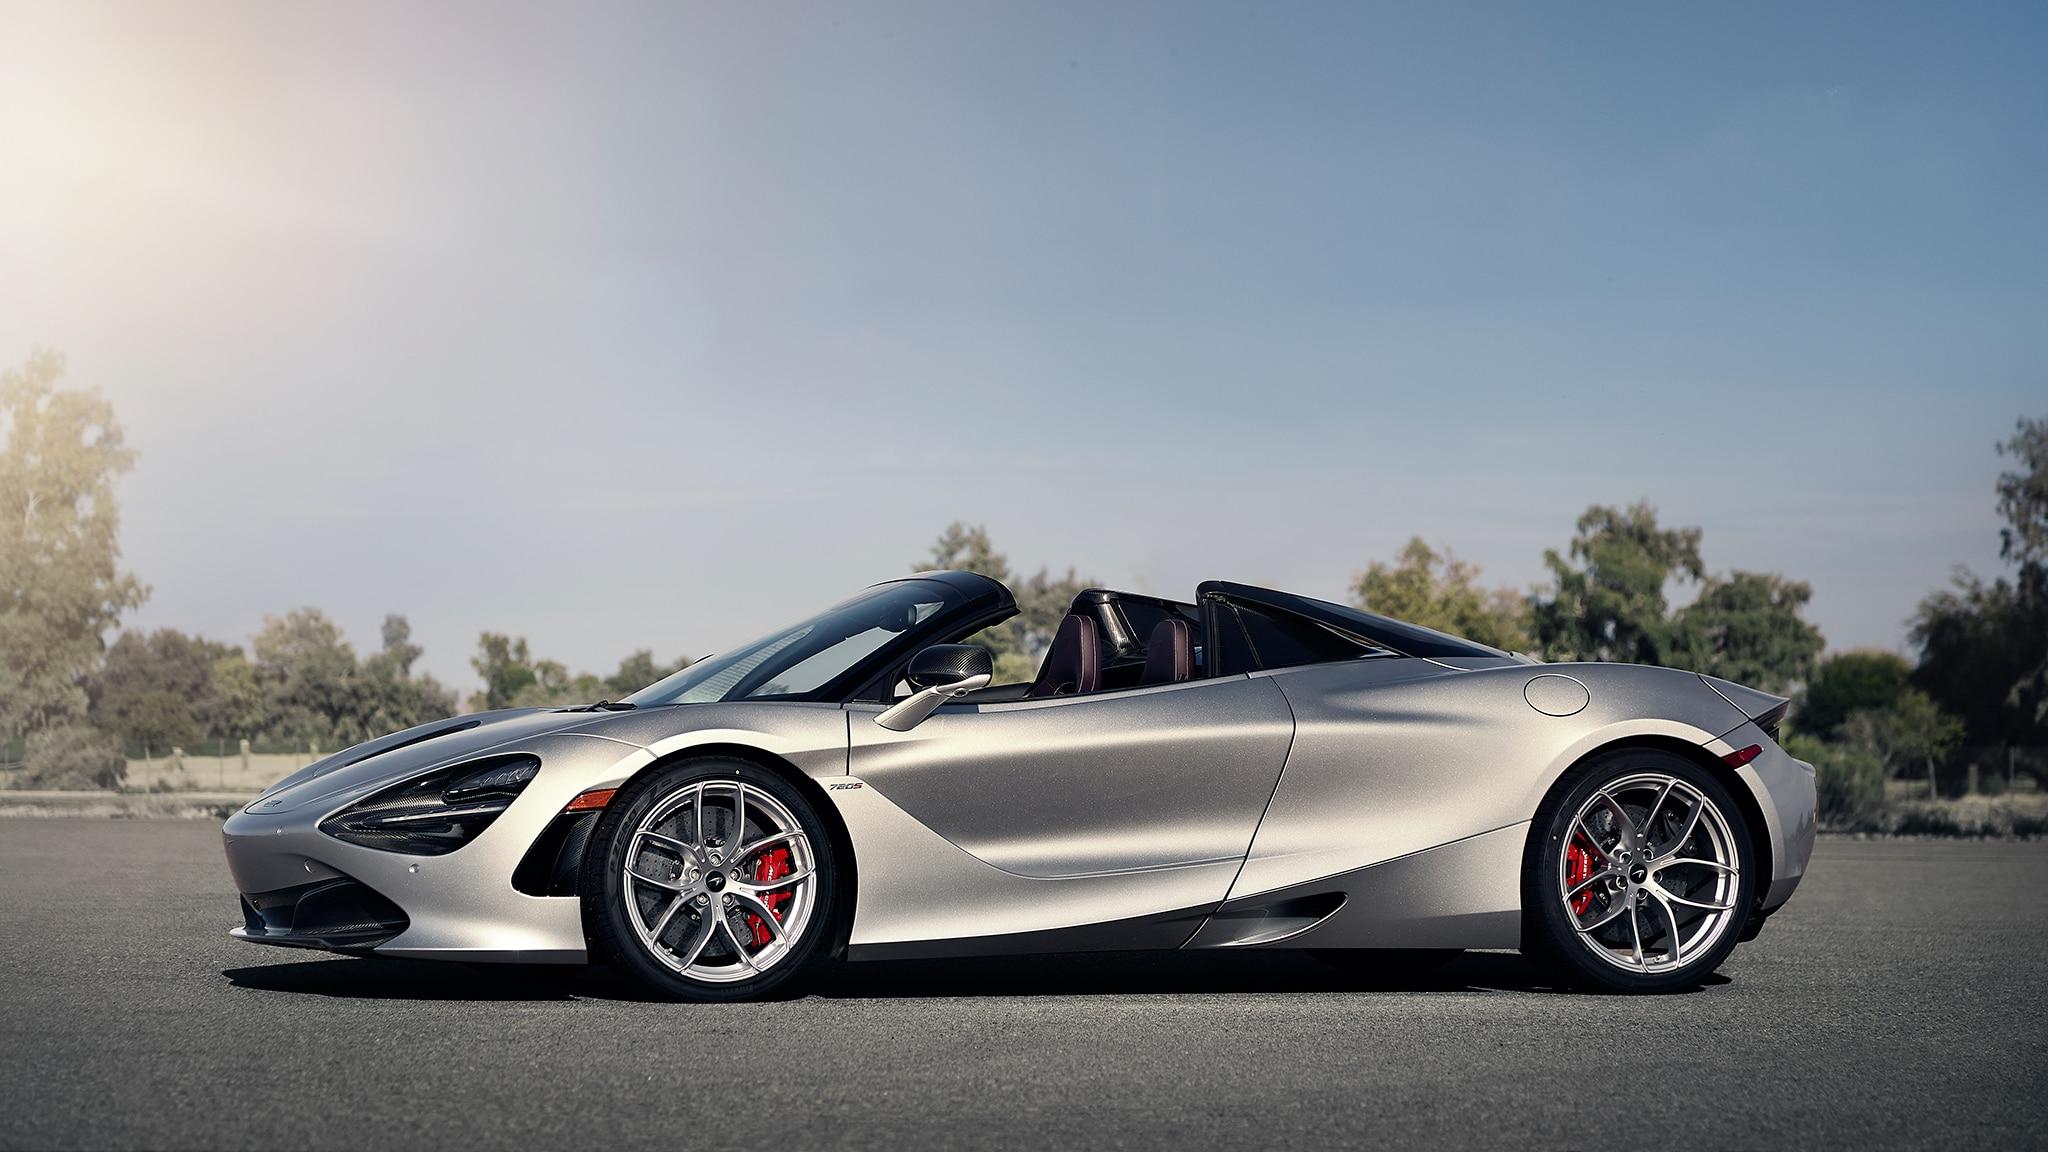 2019 McLaren 720S Spider First Drive Review: All-Around